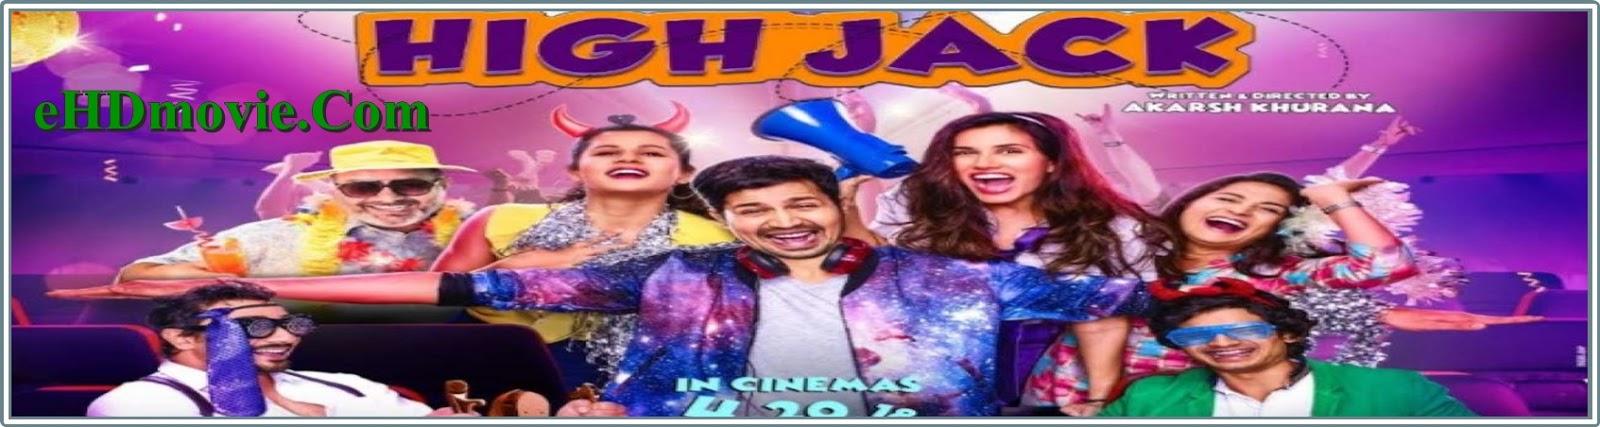 High Jack 2018 Full Movie Hindi 720p - 480p ORG HDRip 400MB - 850MB ESubs Free Download